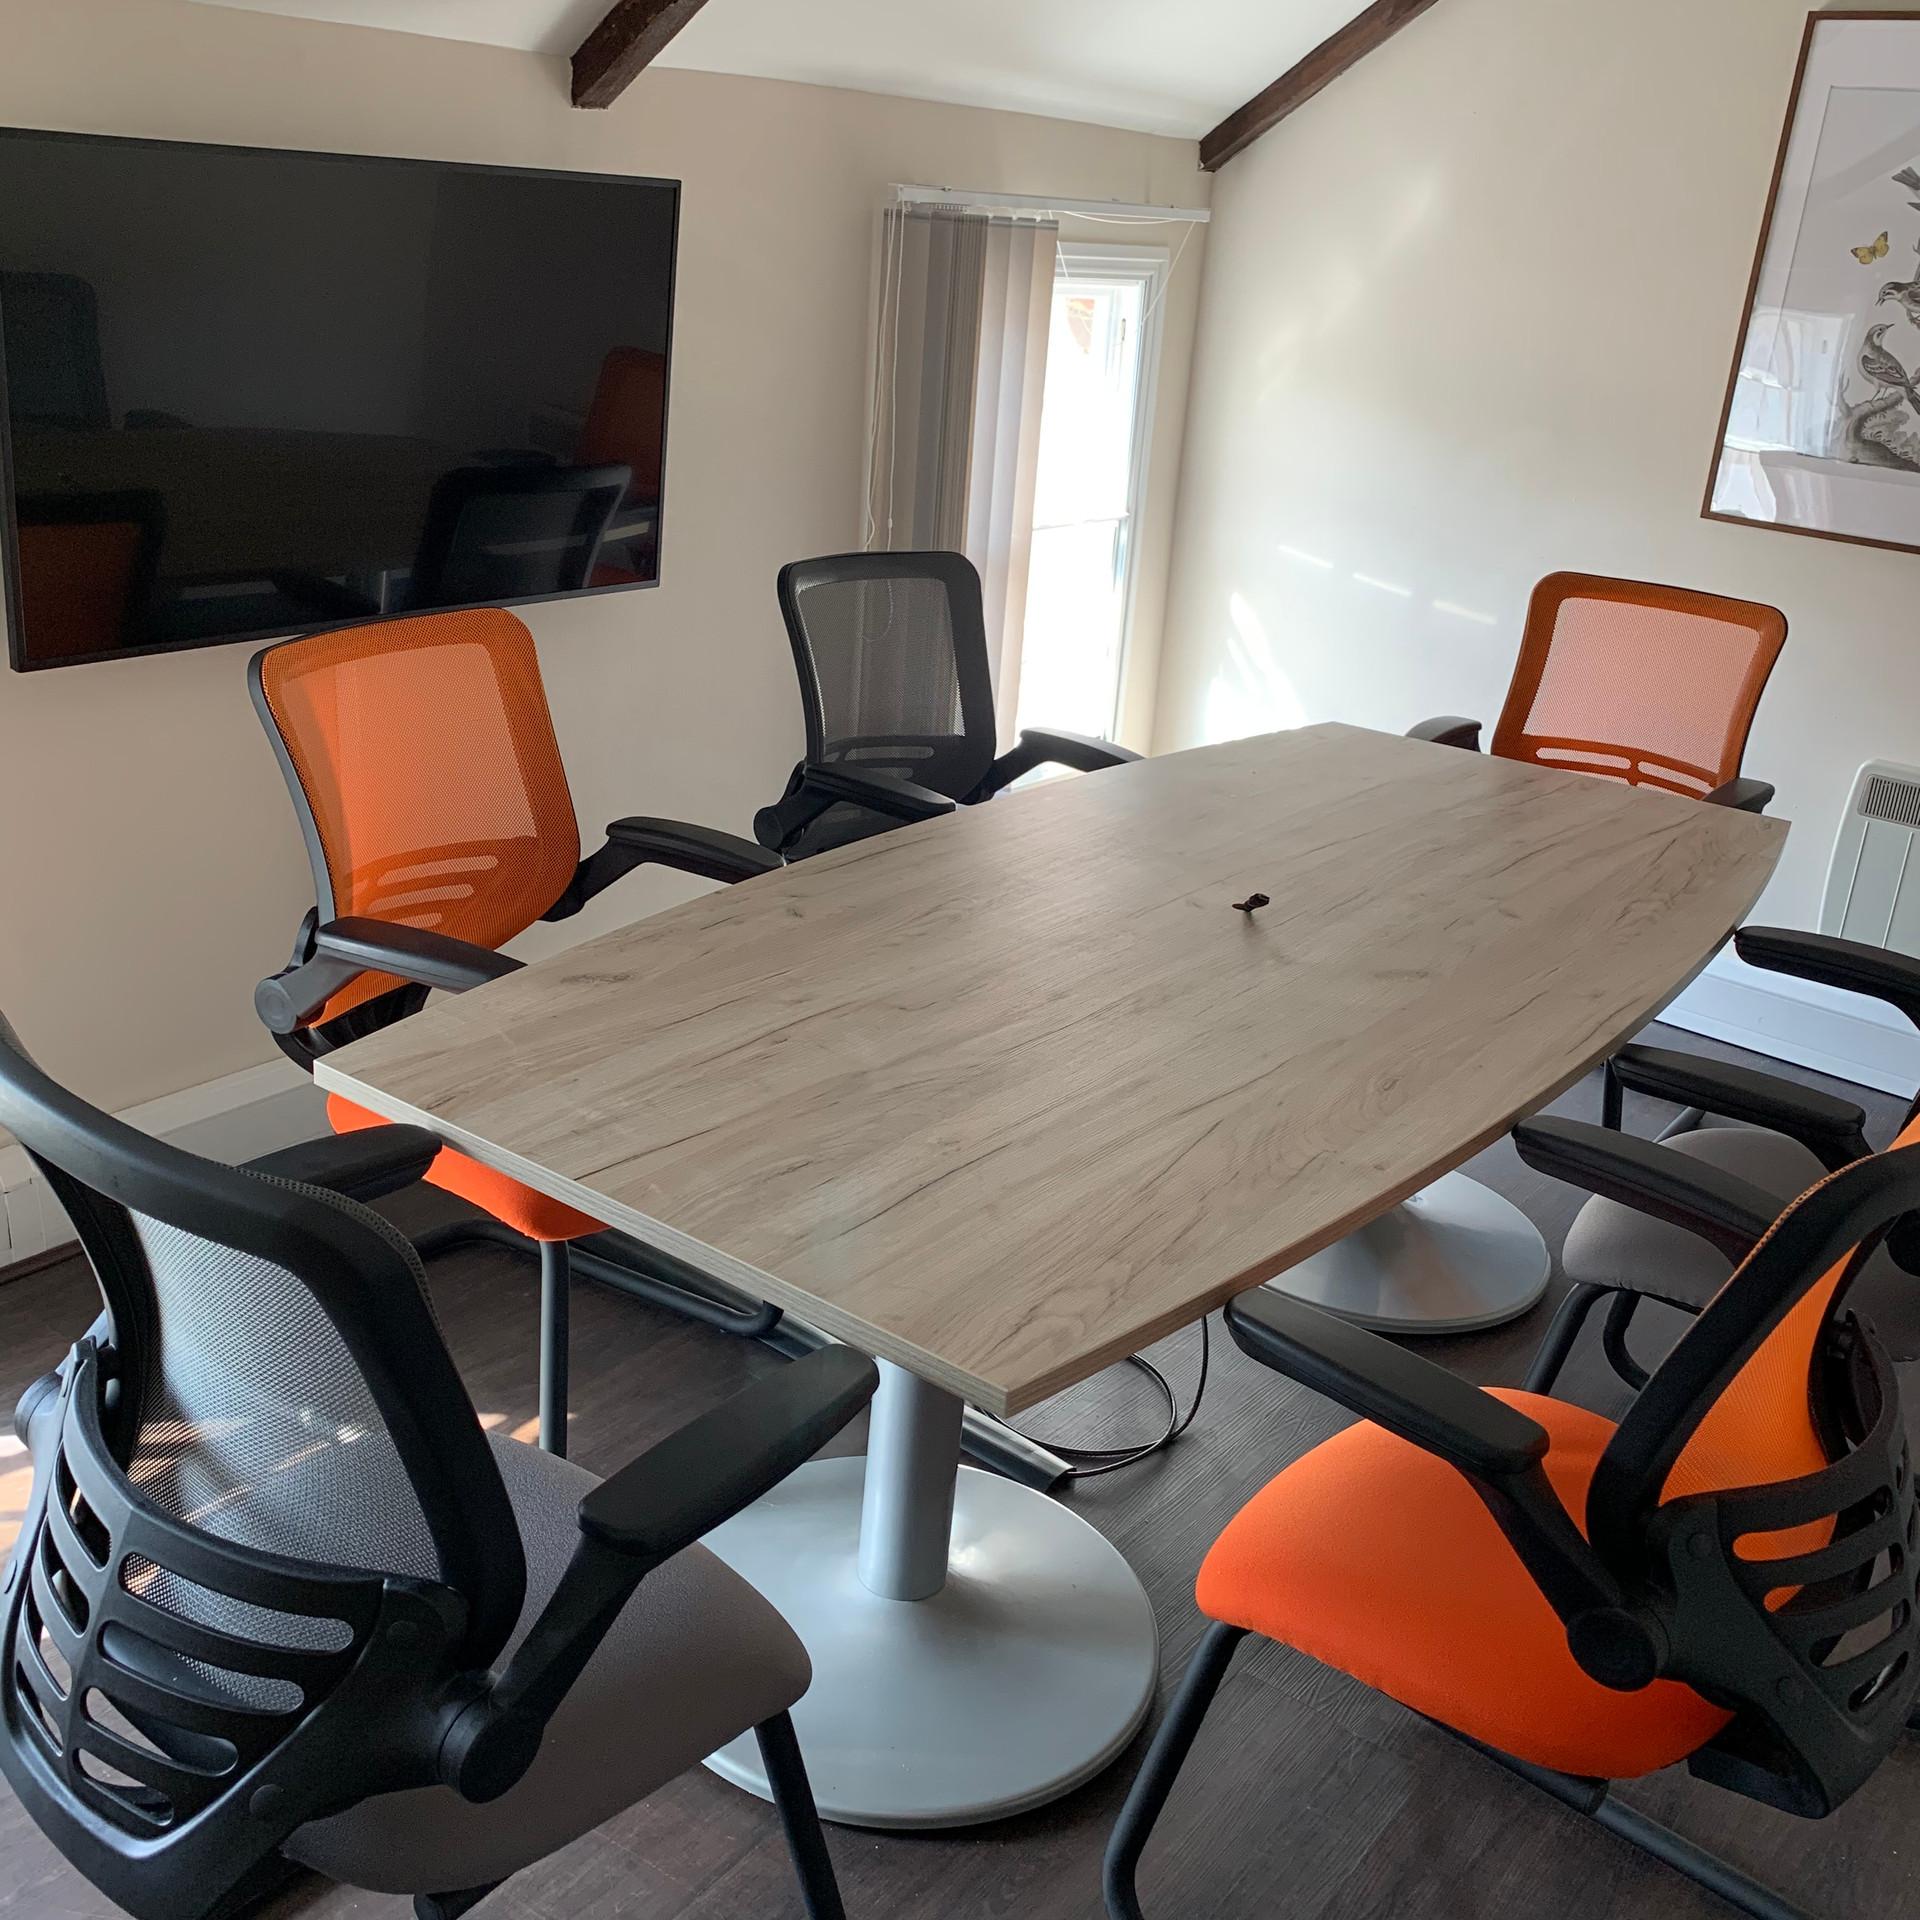 Meeting Room Hire Stony Stratford